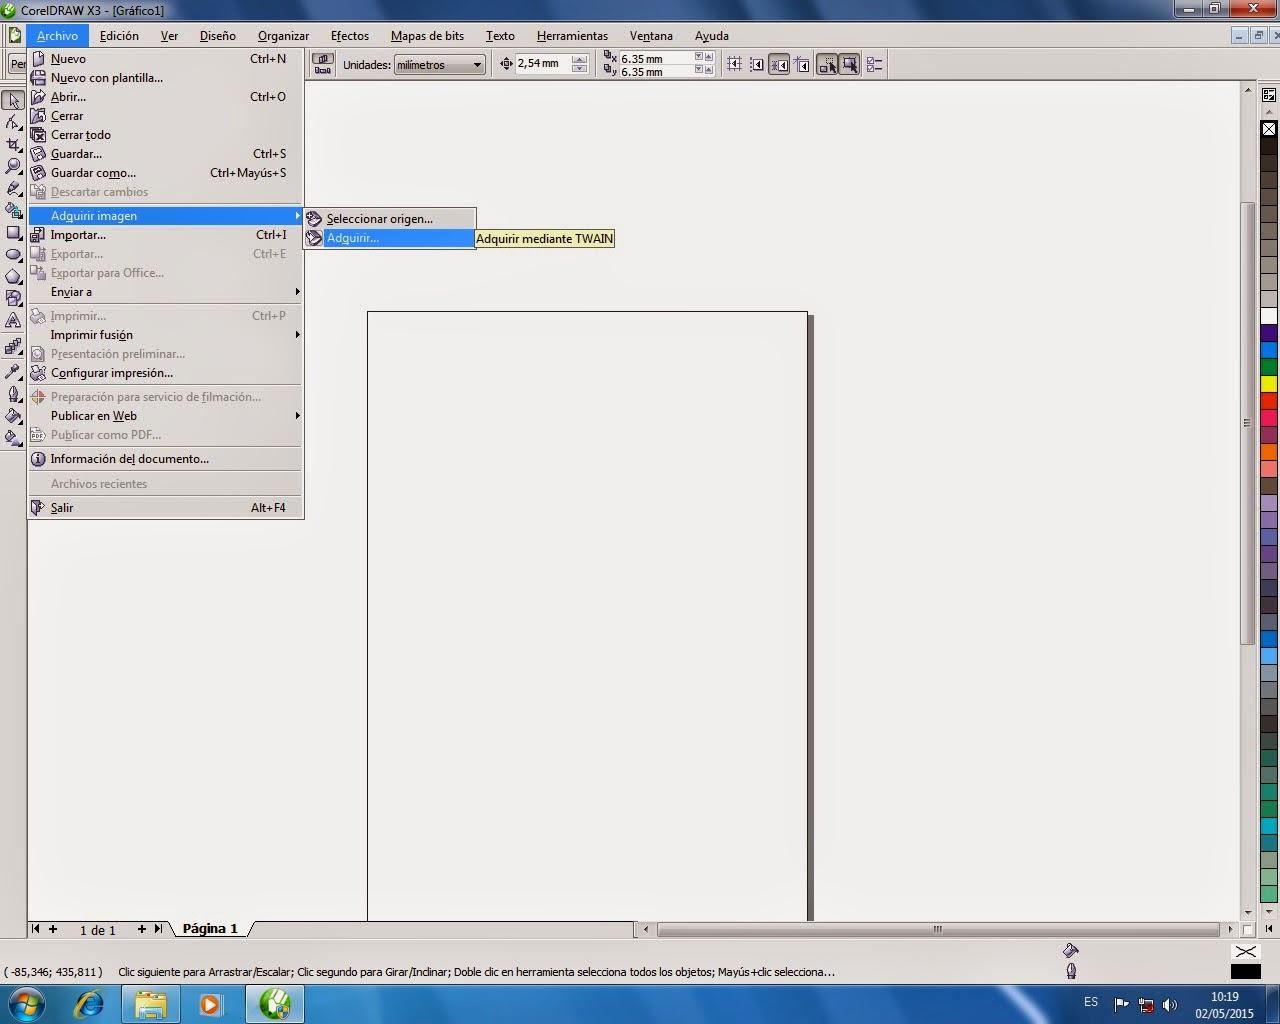 Genius Colorpage Hr6x Slim Driver For Windows 7 Free Download - rentalfree